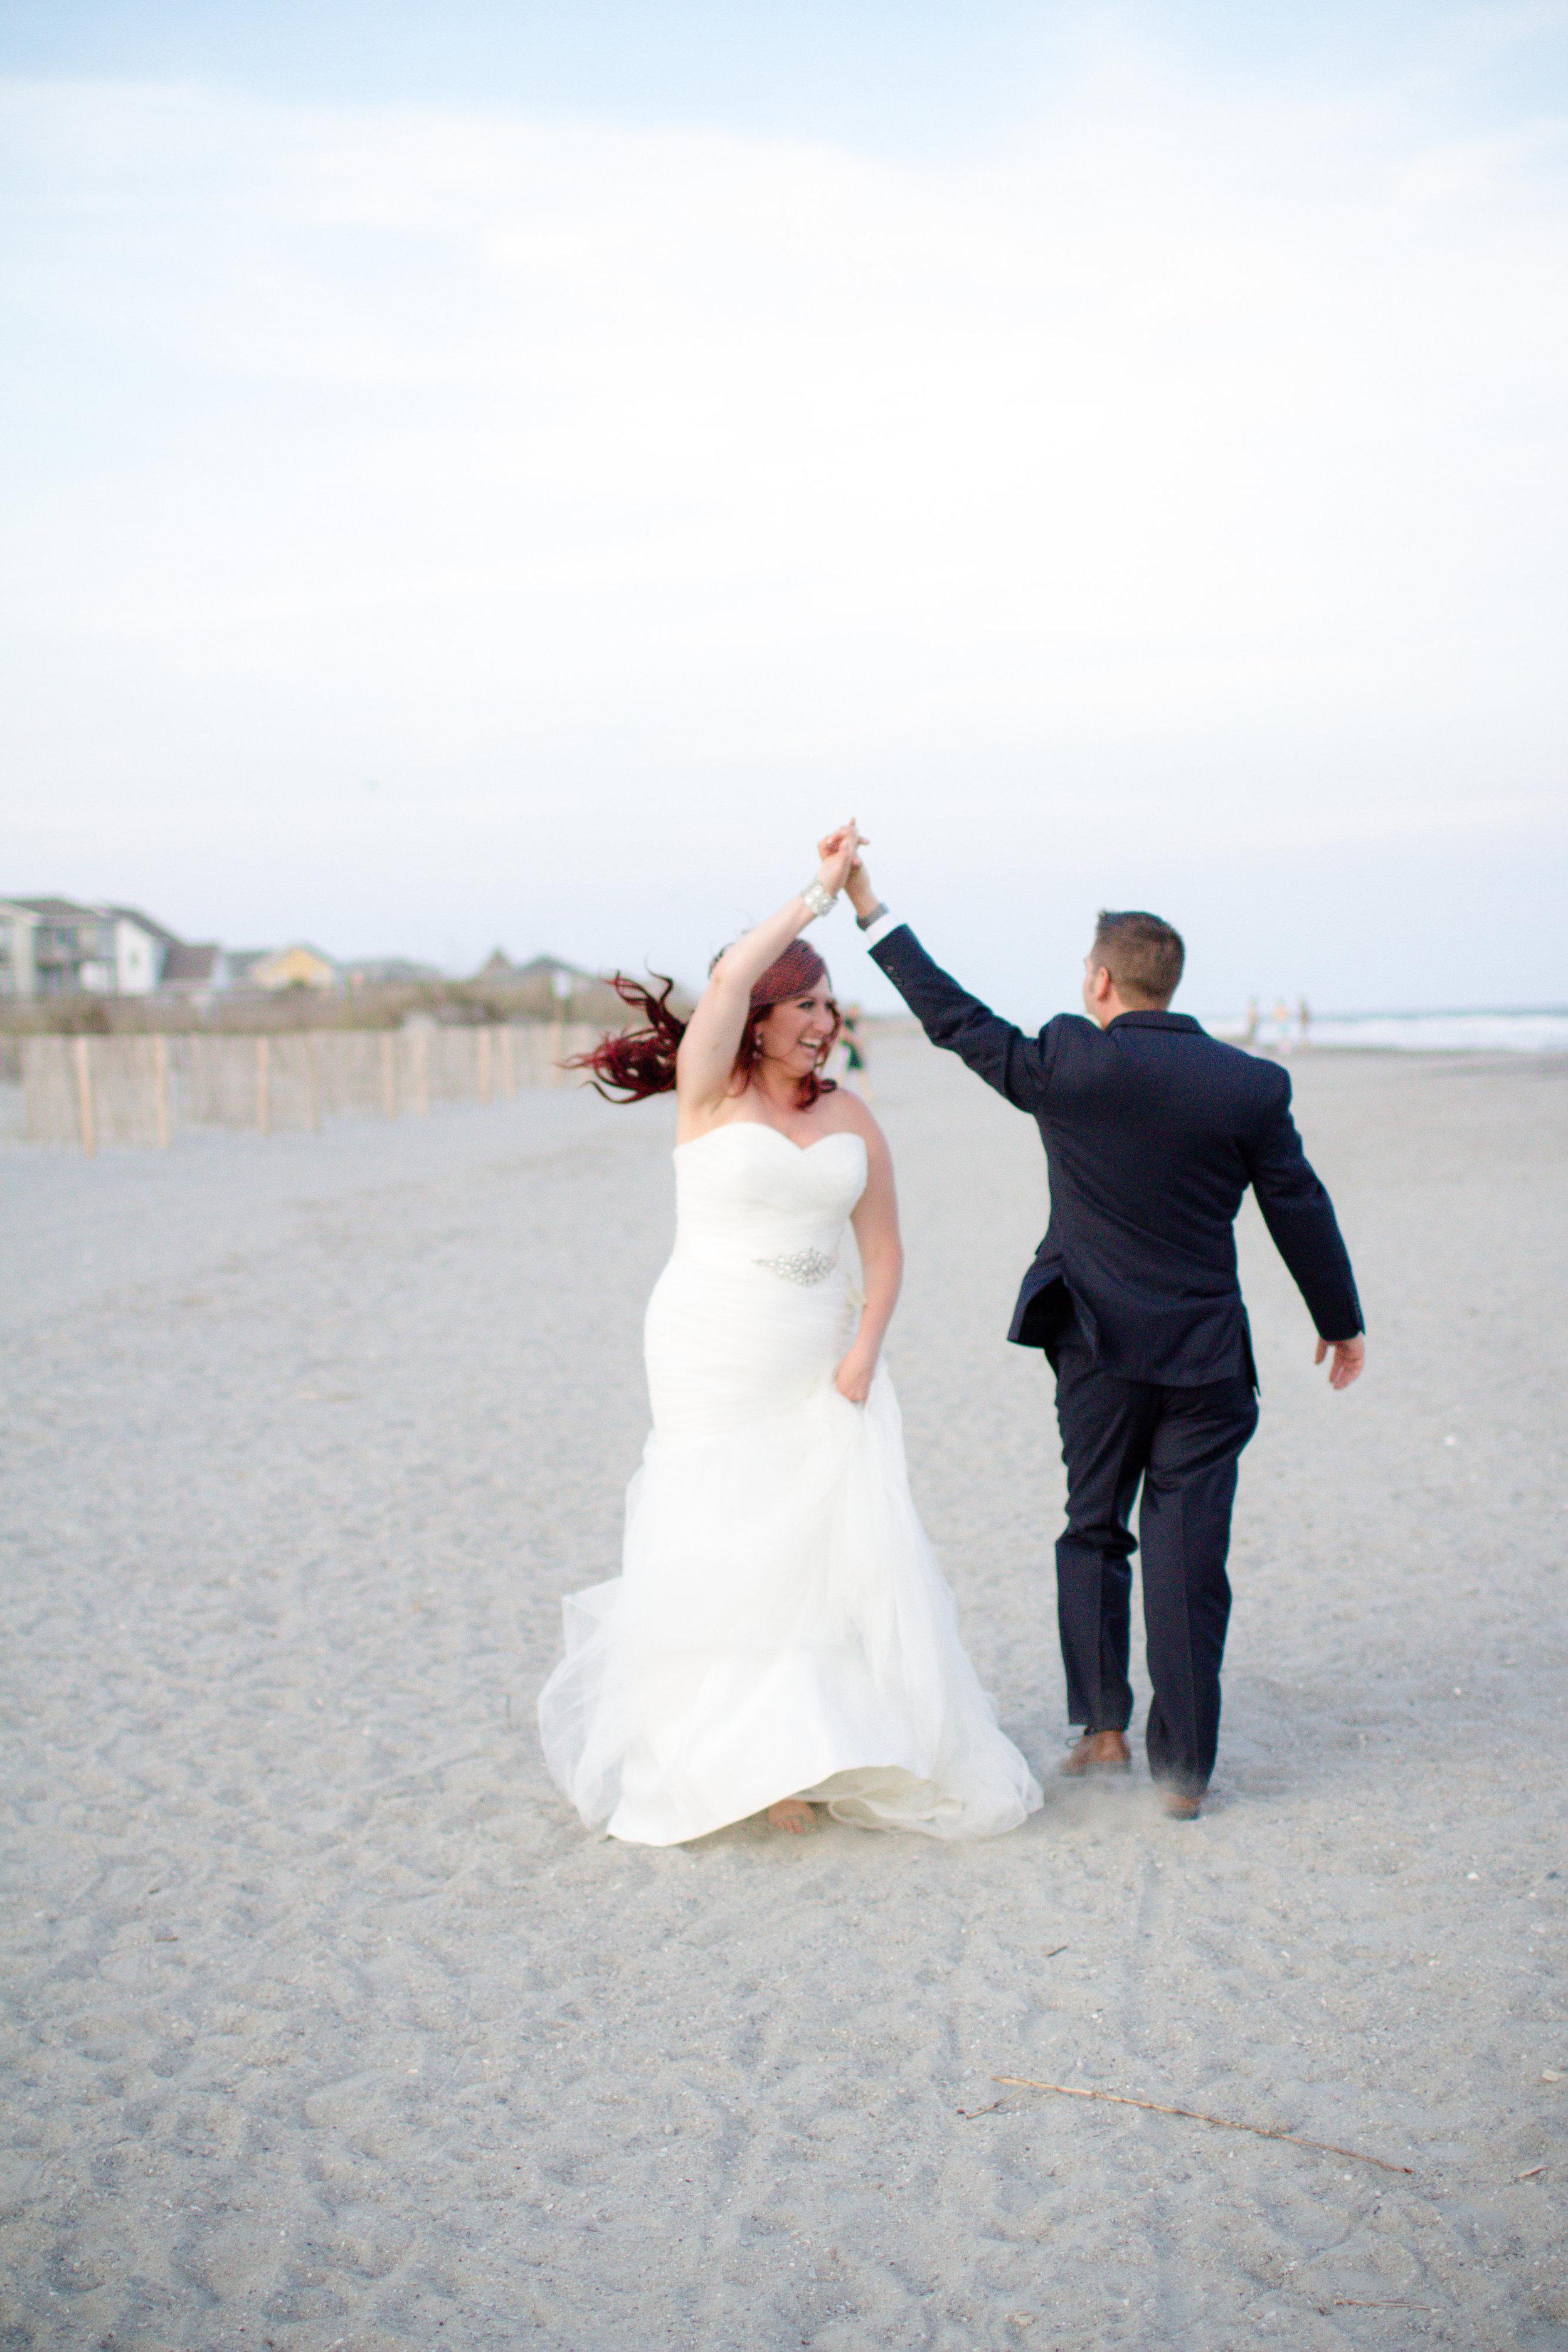 Folly Beach wedding photos | Lorin Marie Photography